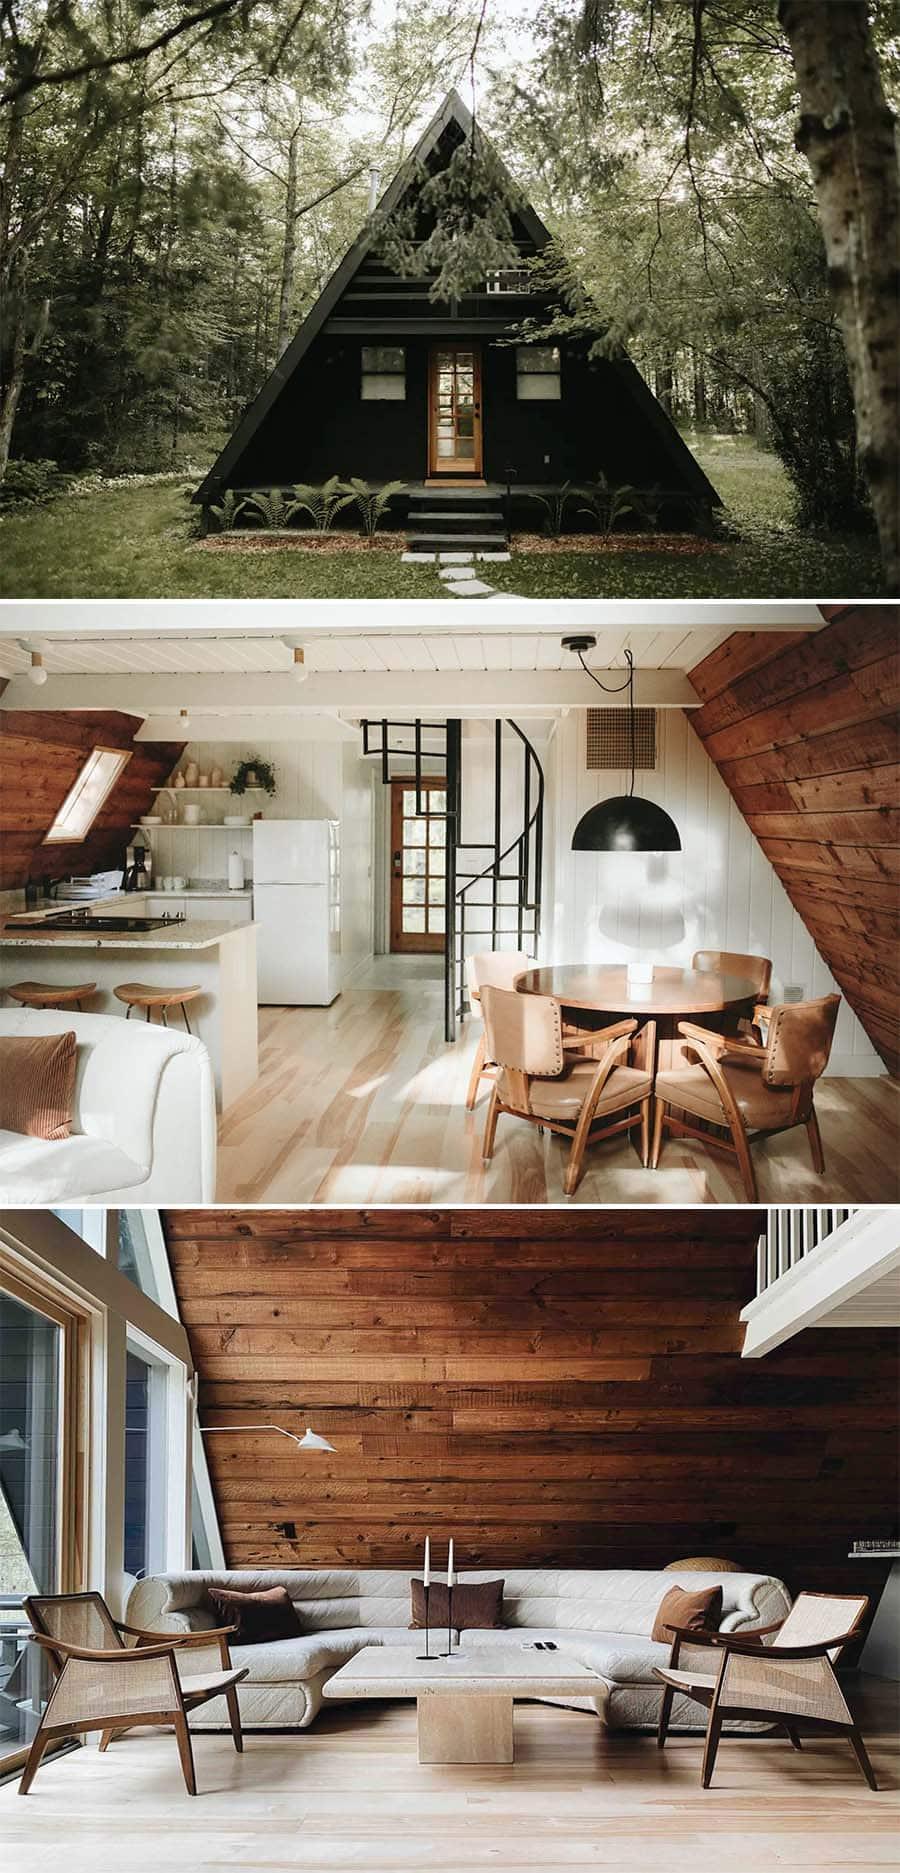 Lilla Norr cozy Airbnb cabin Aframe